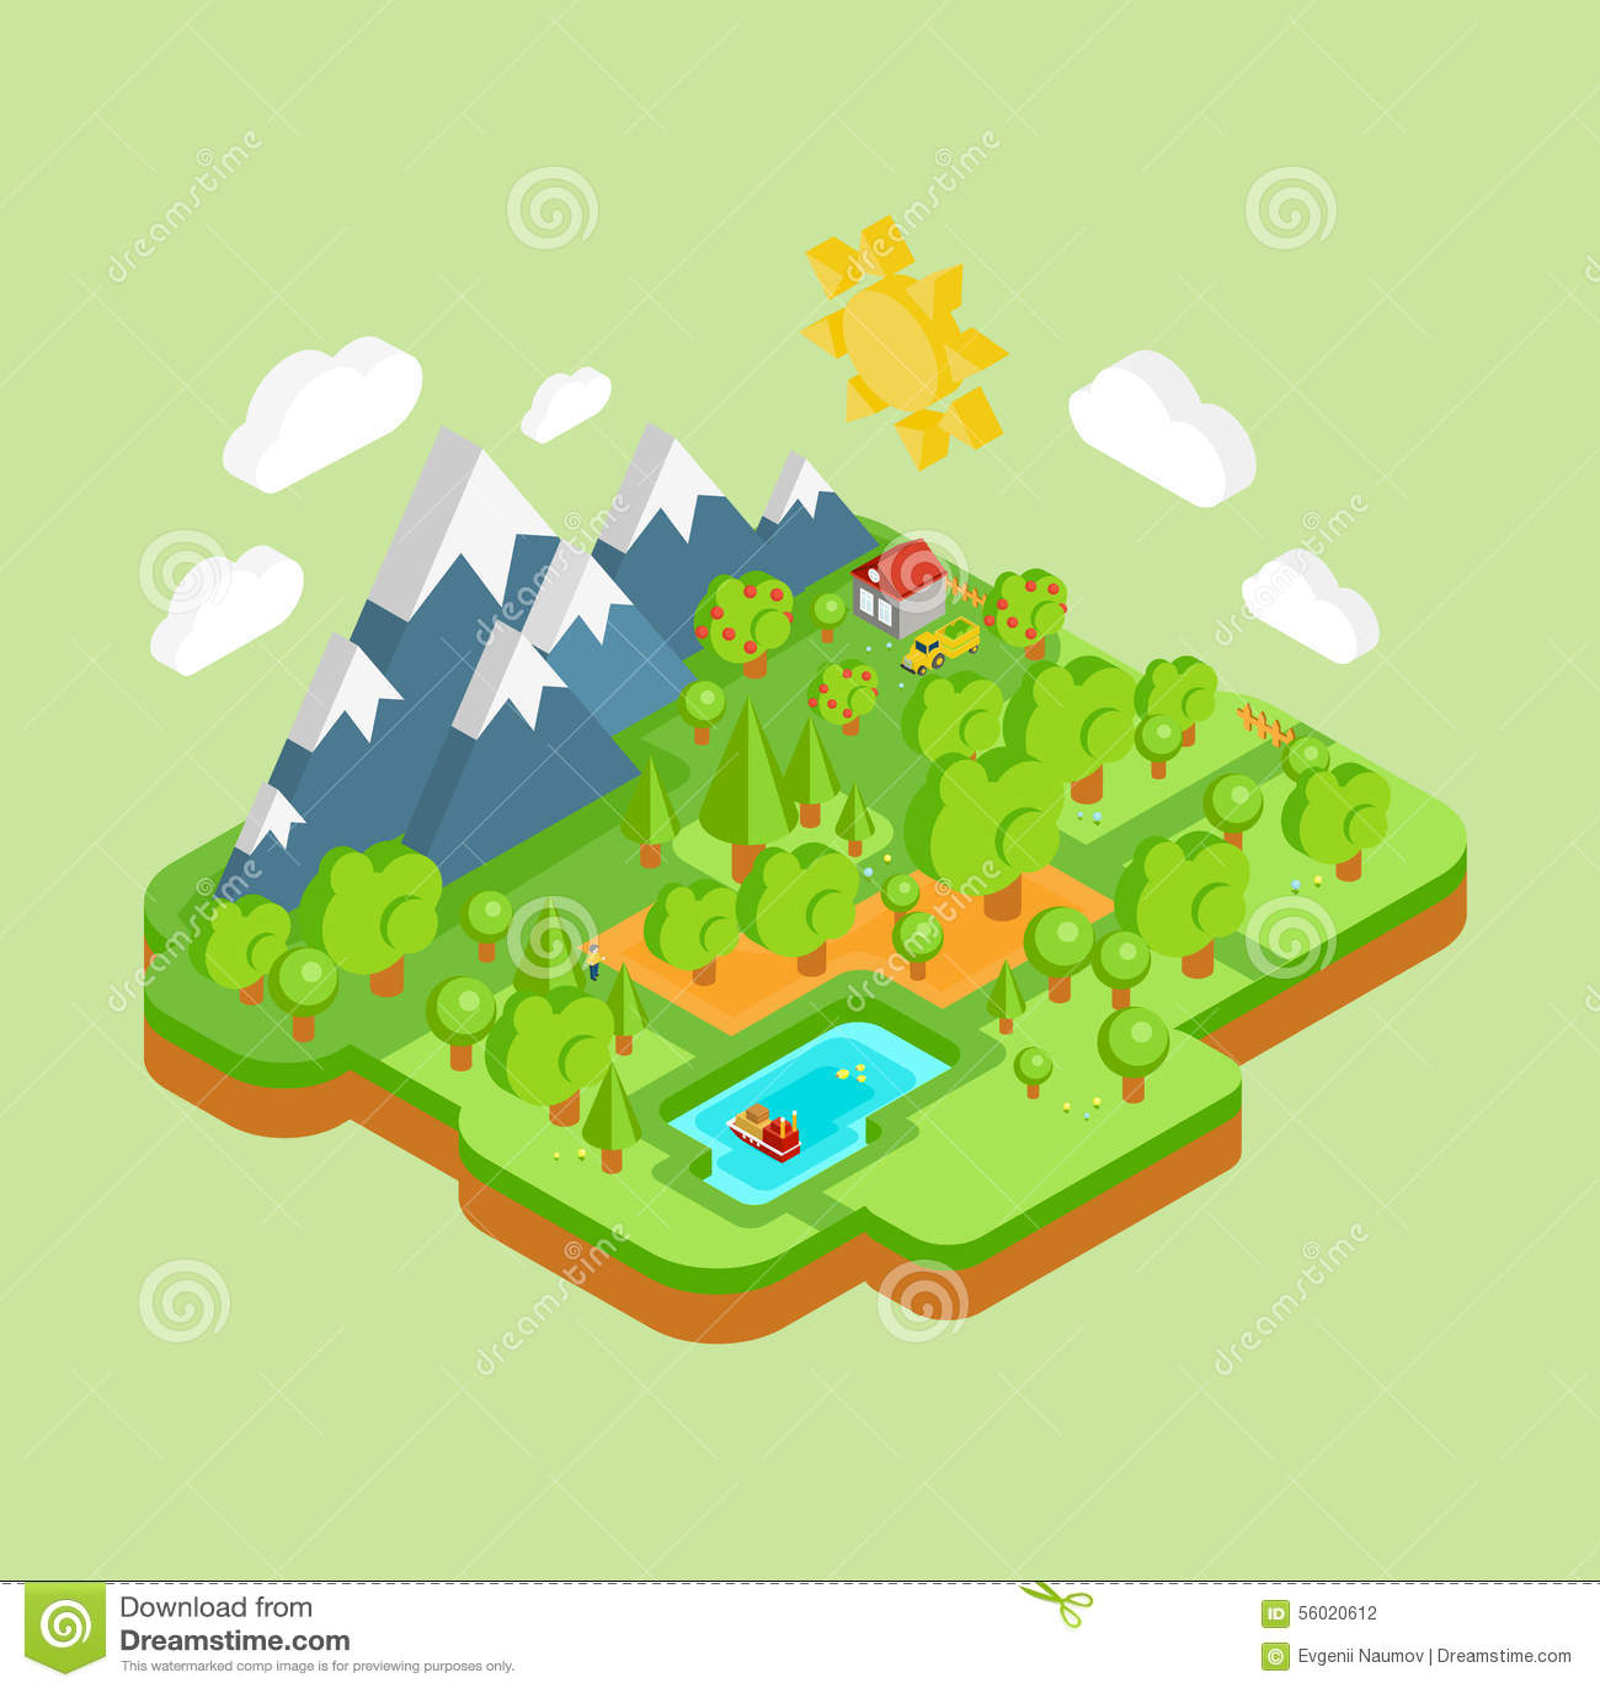 Environmental Concept Earthfriendly Landscapes: Environment Friendly Natural Landscape Stock Vector